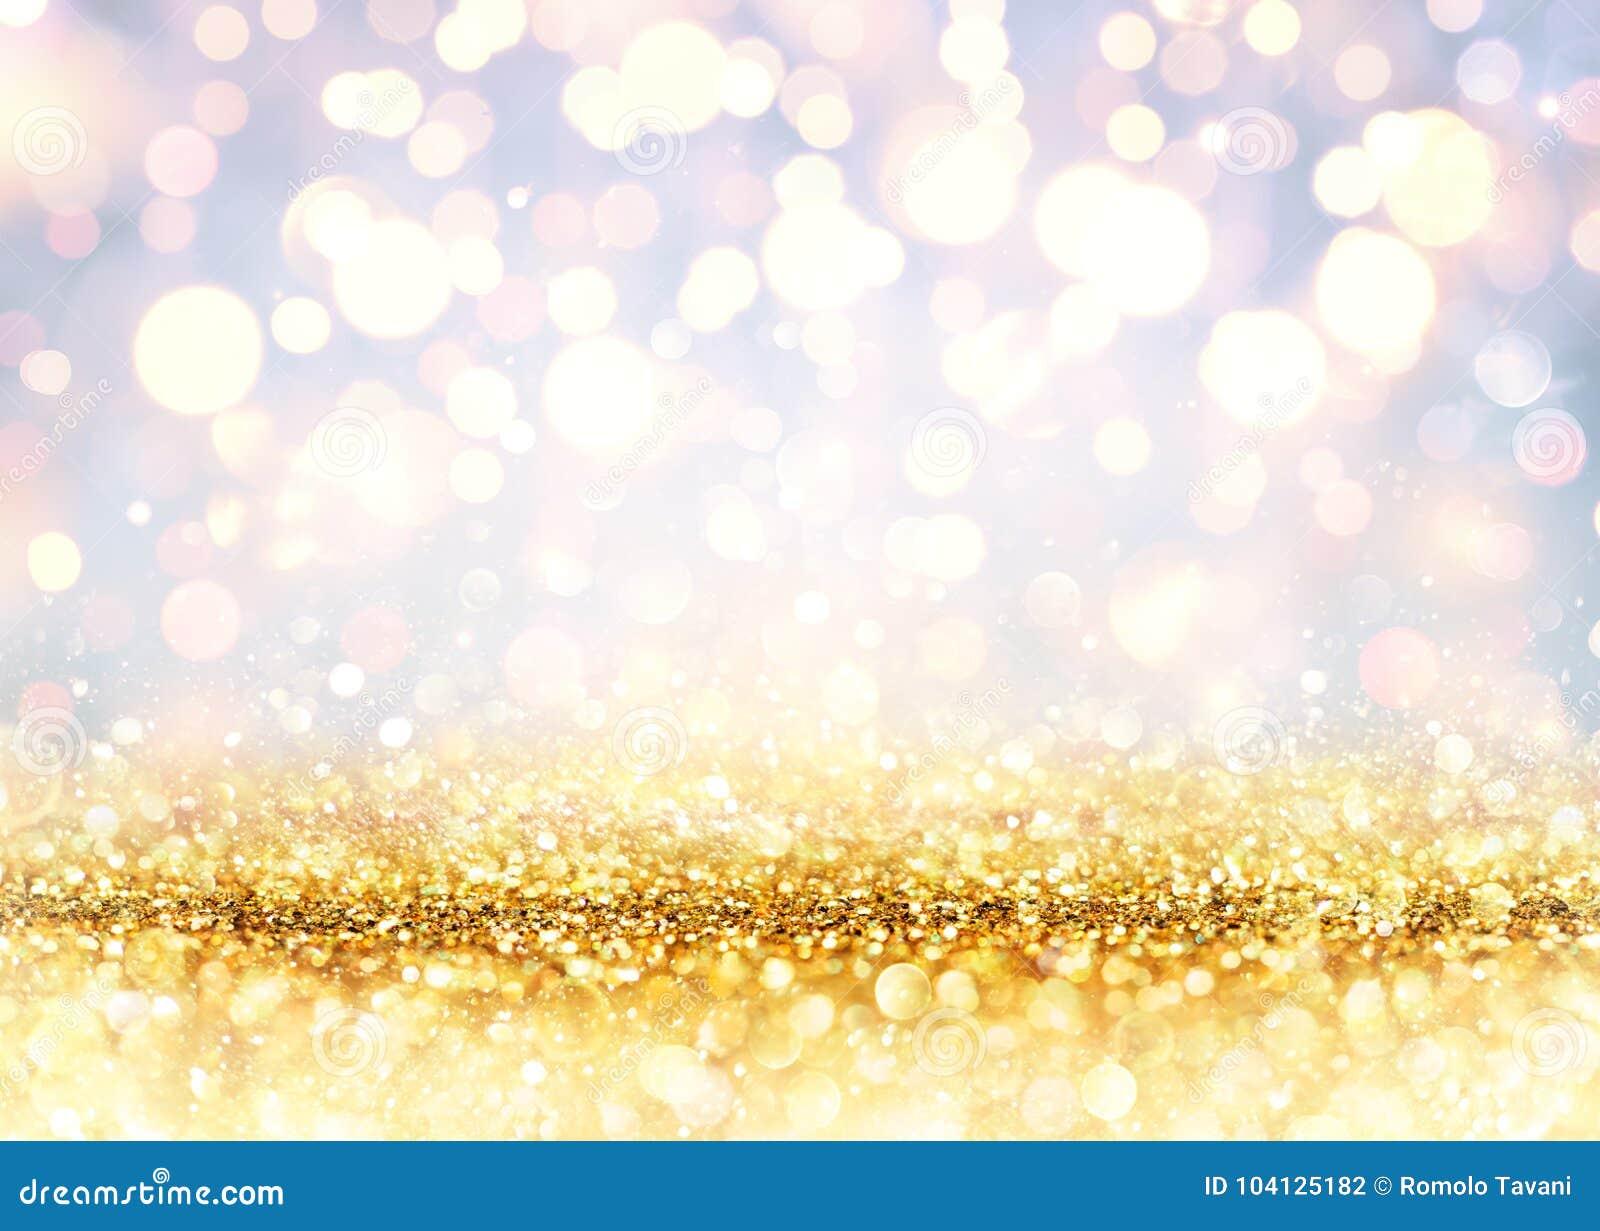 Golden Glitter On Shiny backdrop